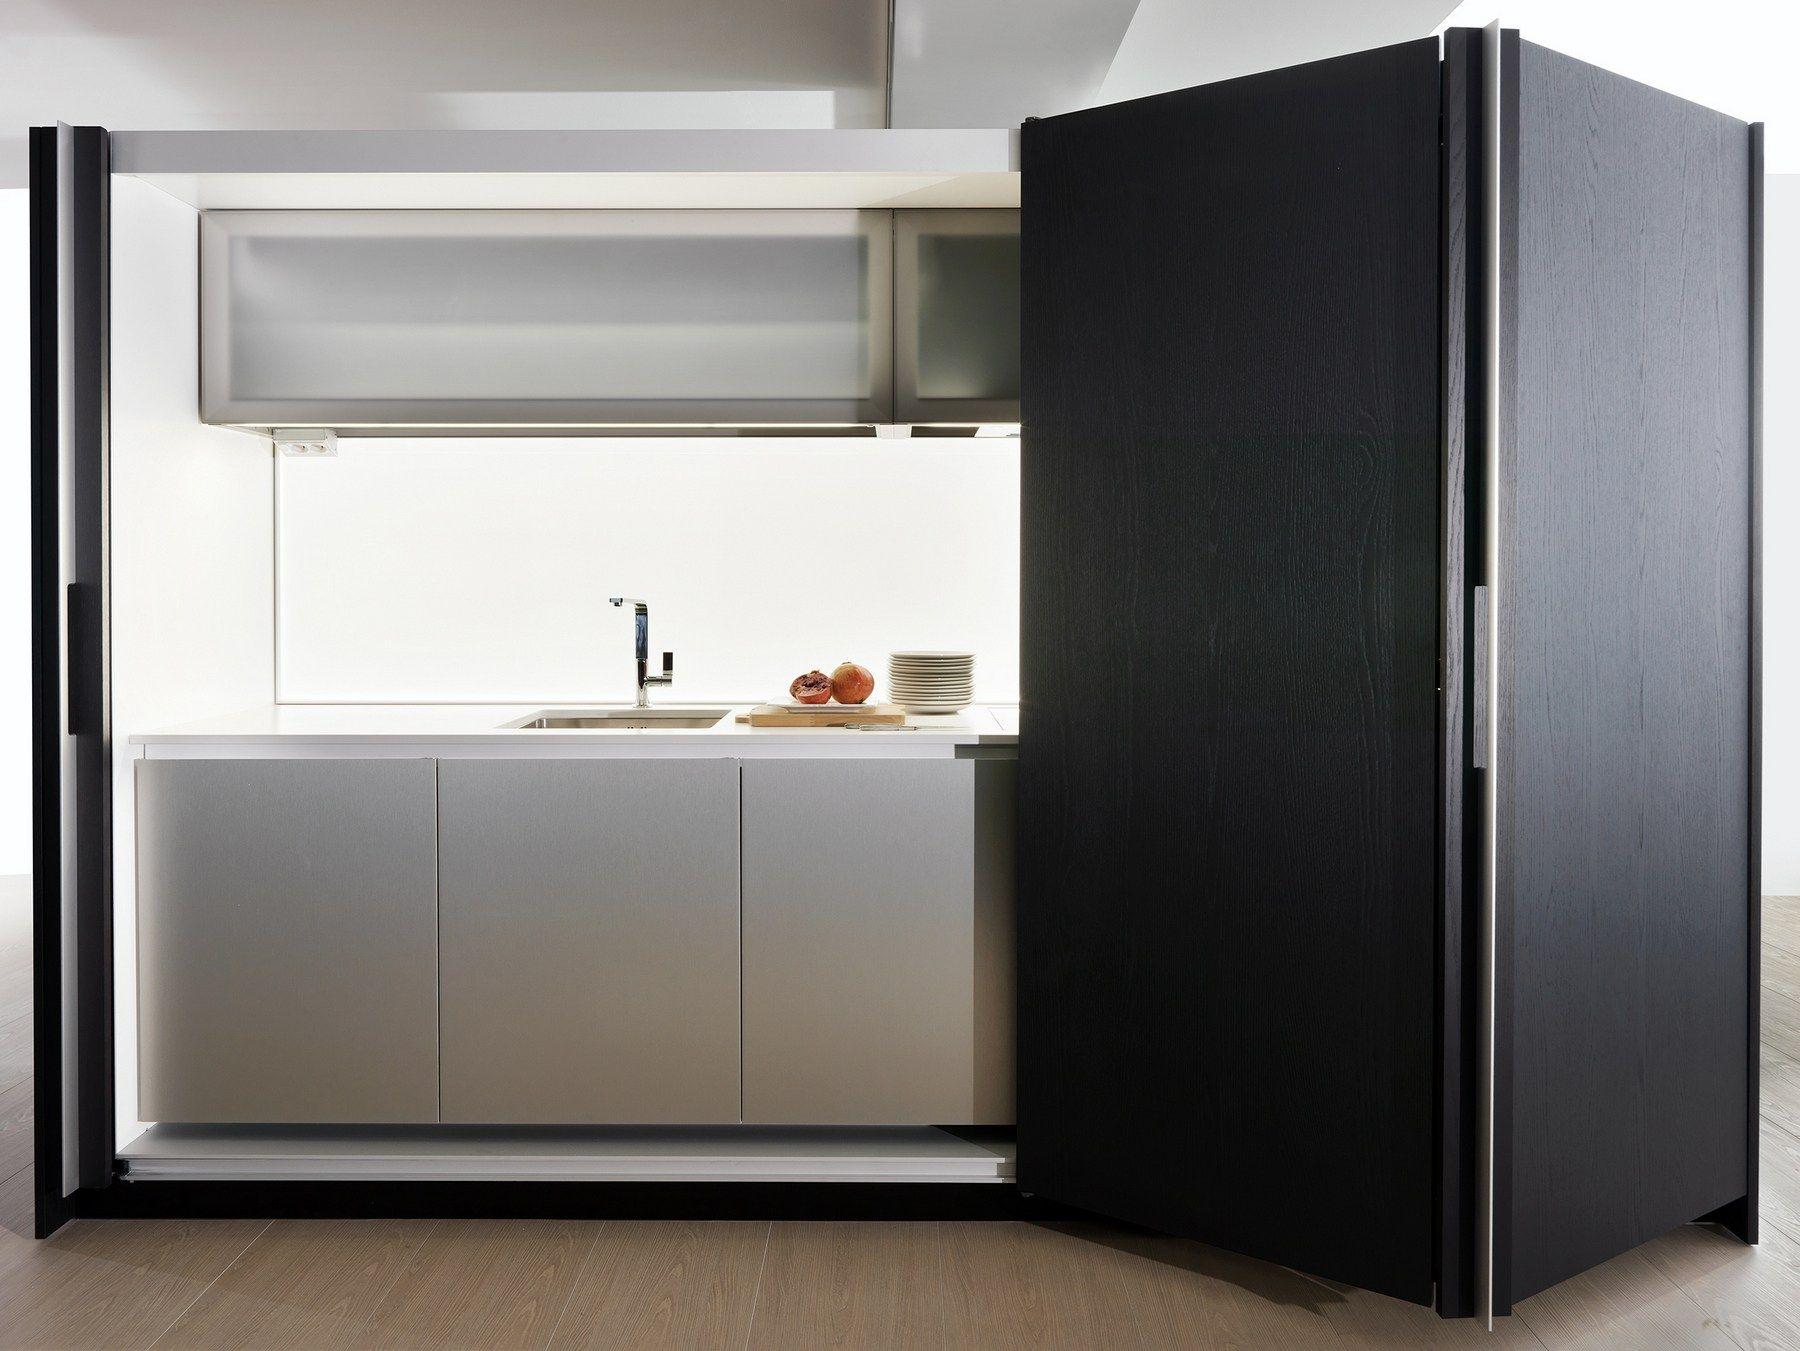 Hideaway Linear Kitchen Tivali By Dada Design Dante Bonuccelli